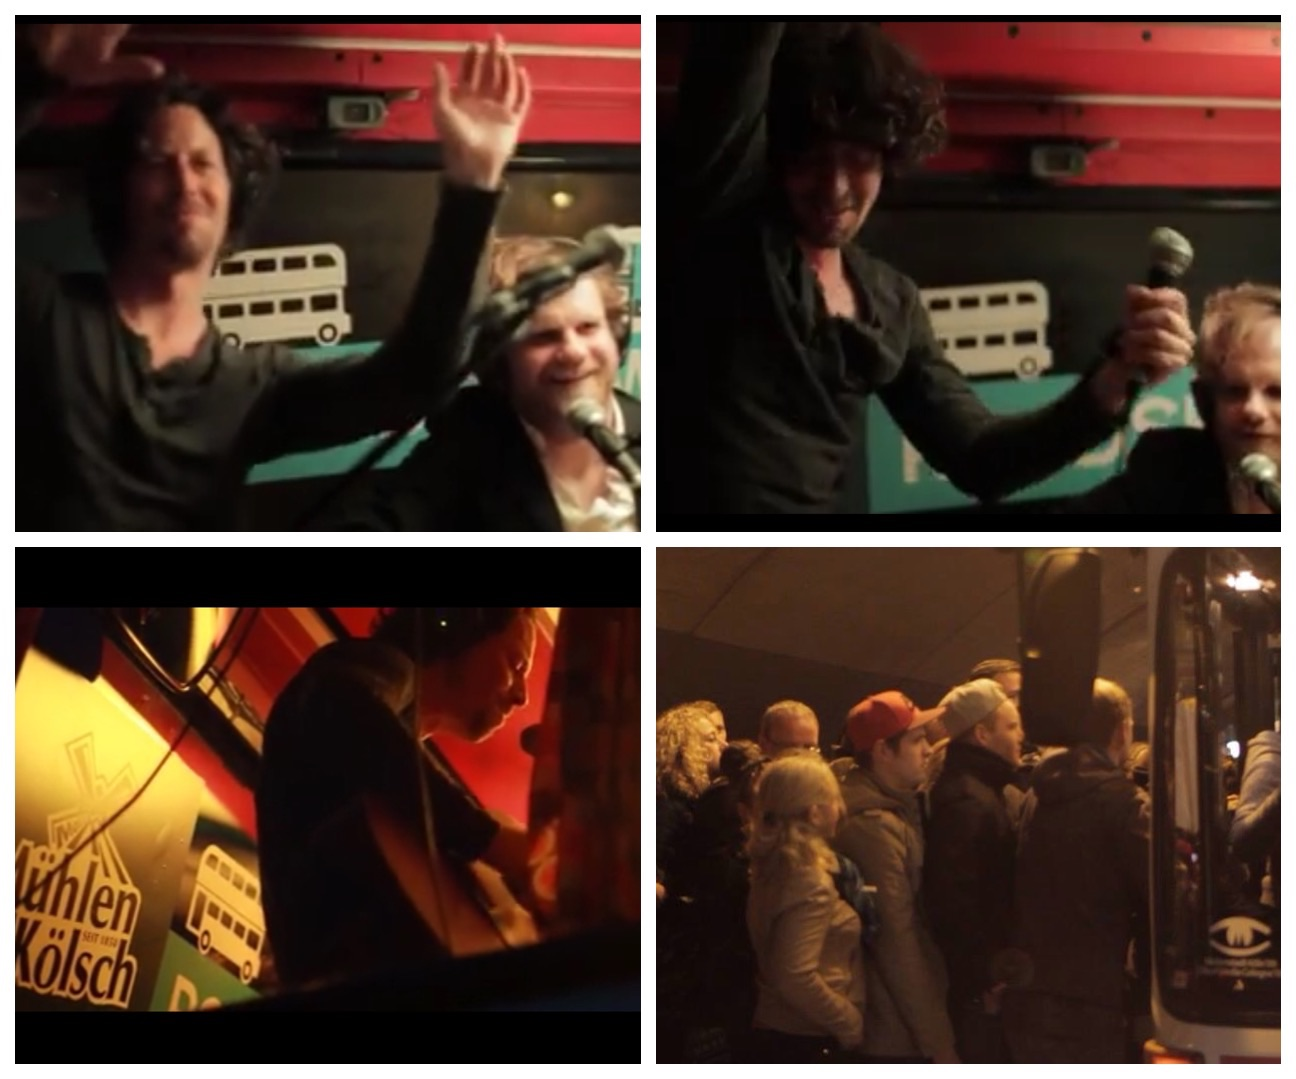 Blockflöte des Todes, planbar Events, Wohngemeinschaft Köln, jens ponke, Guido Bungart, One Take Toni, Hopping Jack, Ehrenfeld, Shuttlebus Party